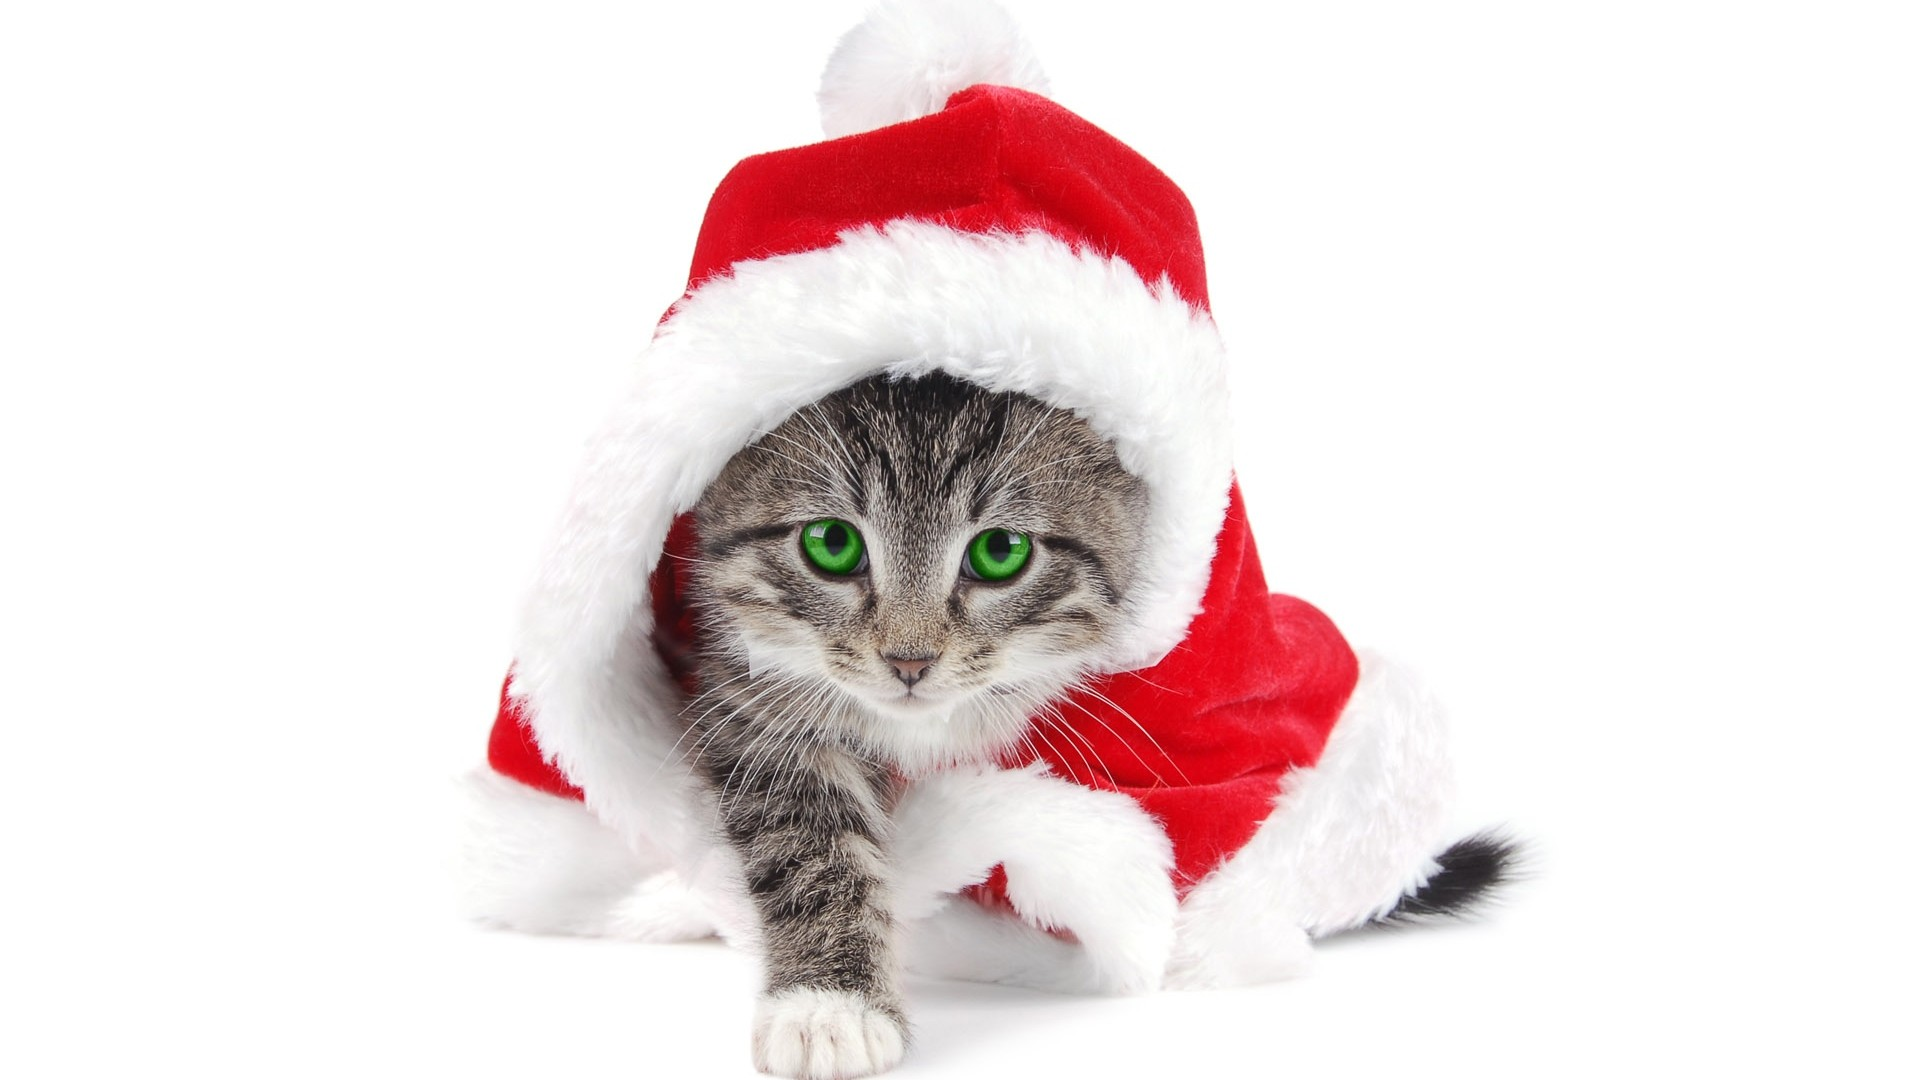 Cute Christmas Backgrounds Cute Christmas Desktop Backgrounds 1920x1080